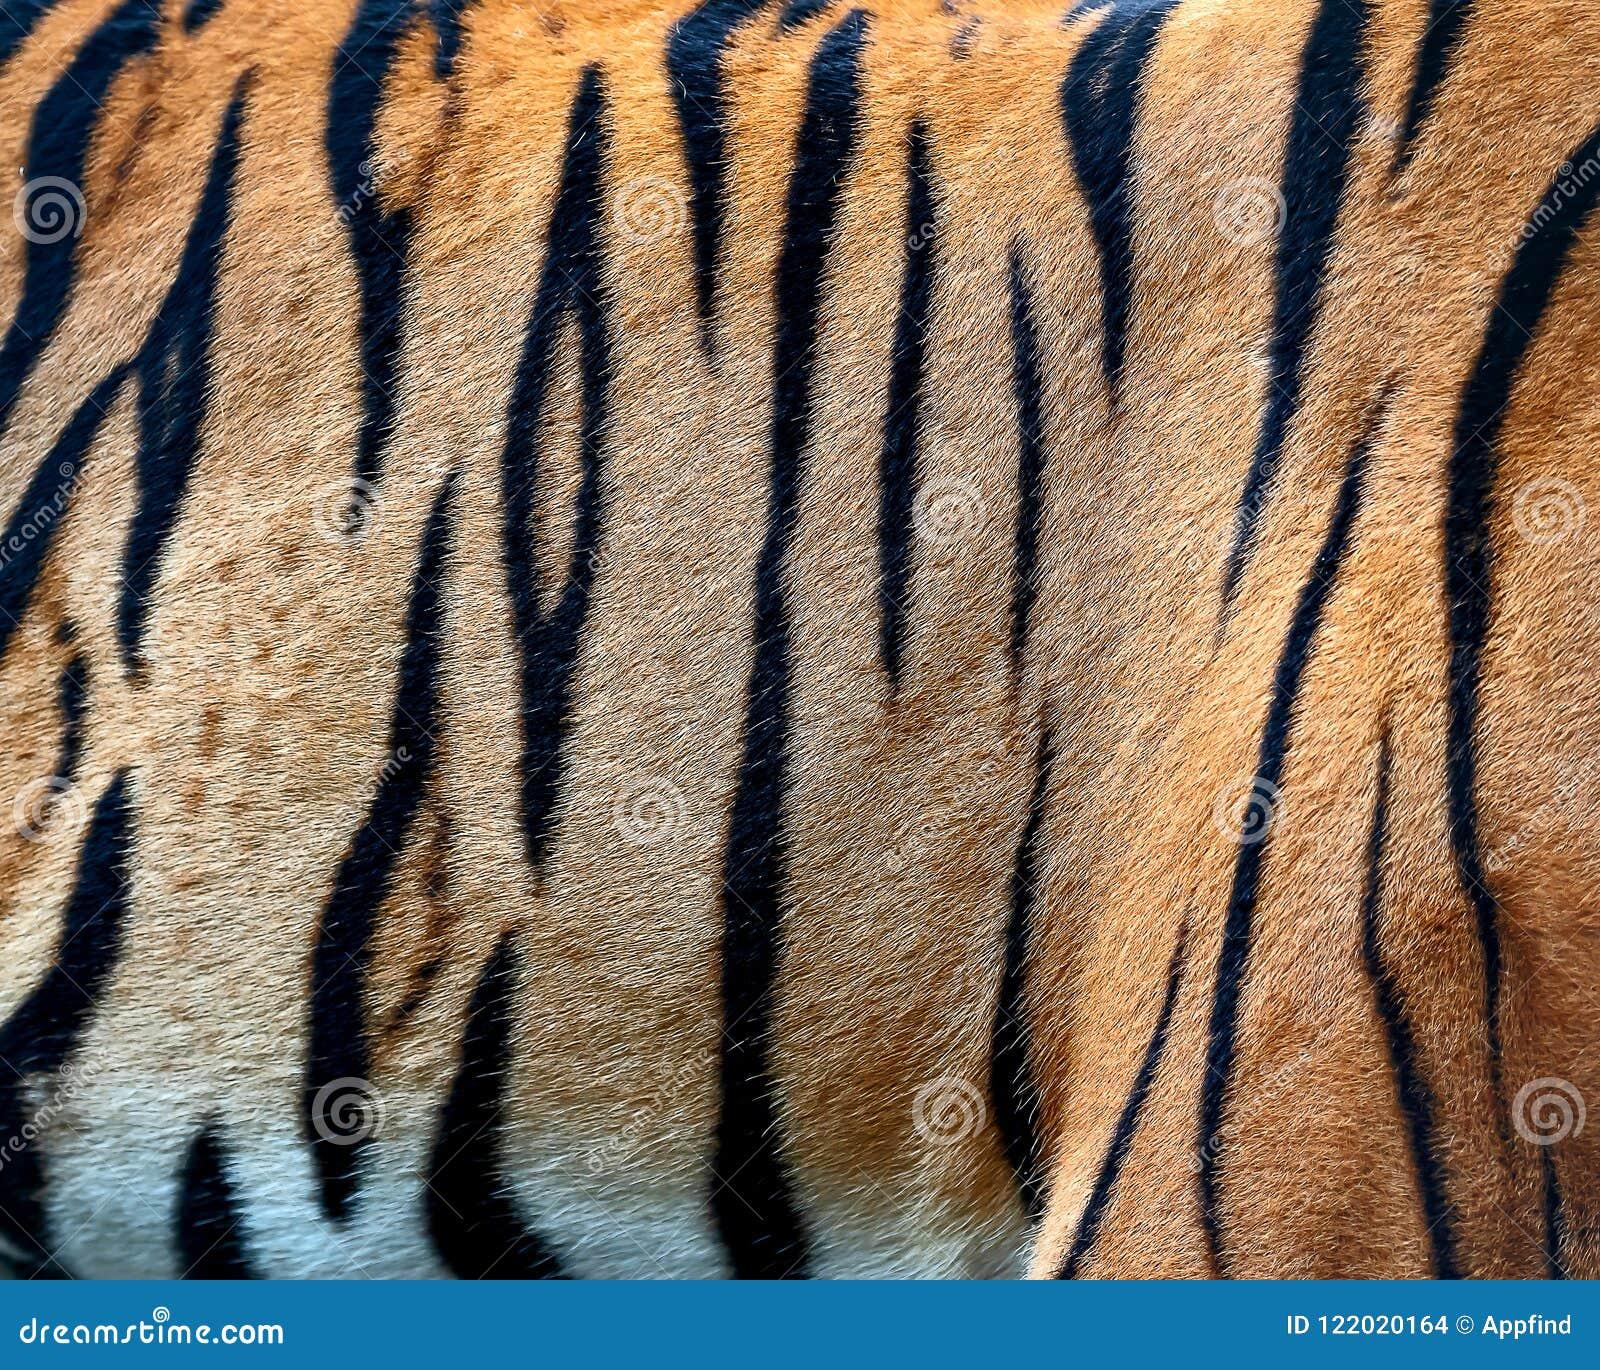 tiger skin texture stock photo image of orange black 122020164